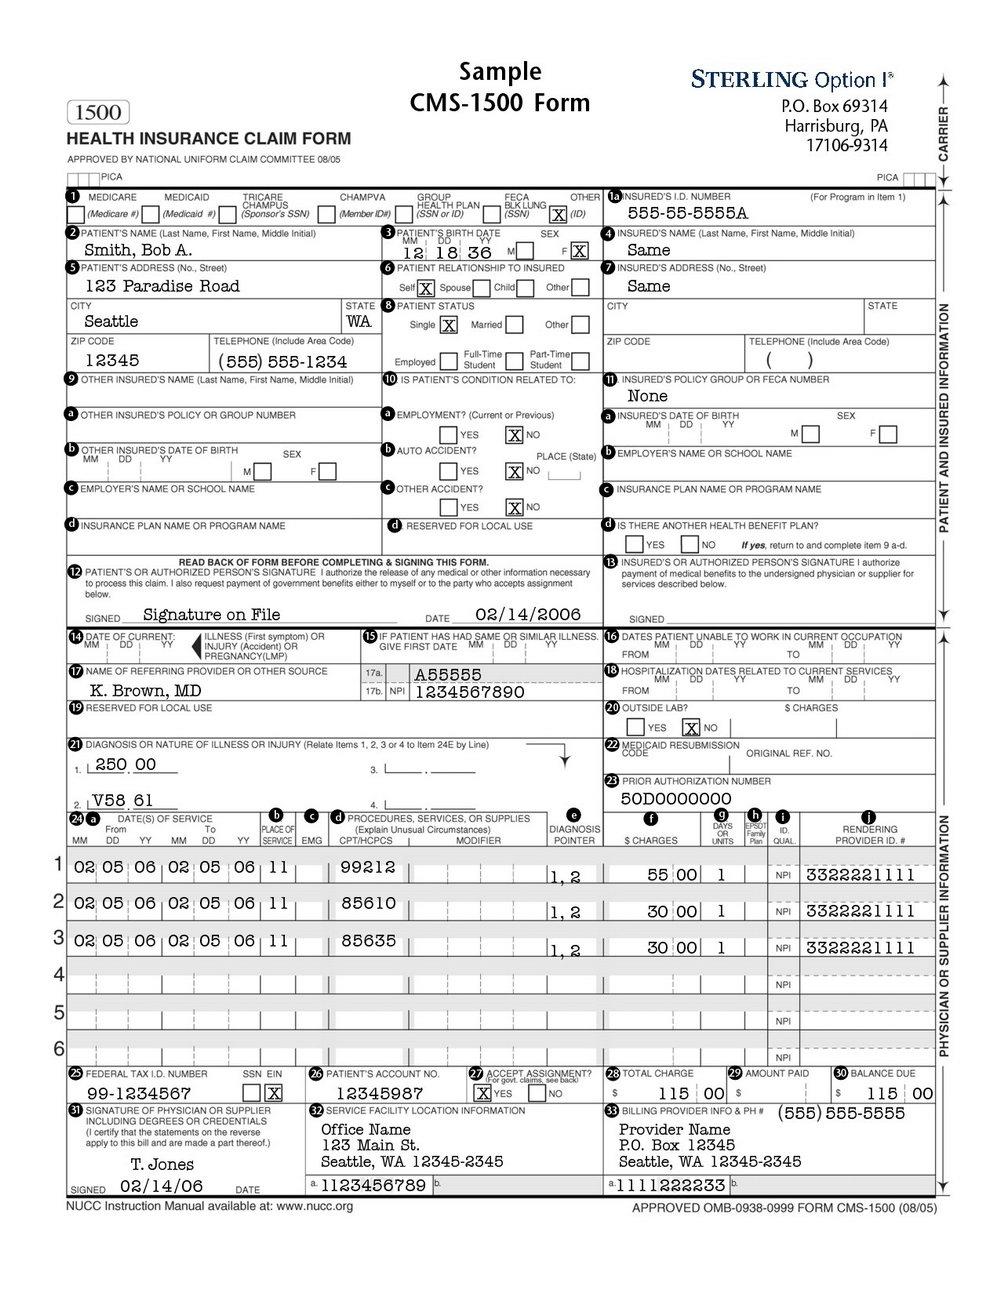 Claim Form Cms 1500